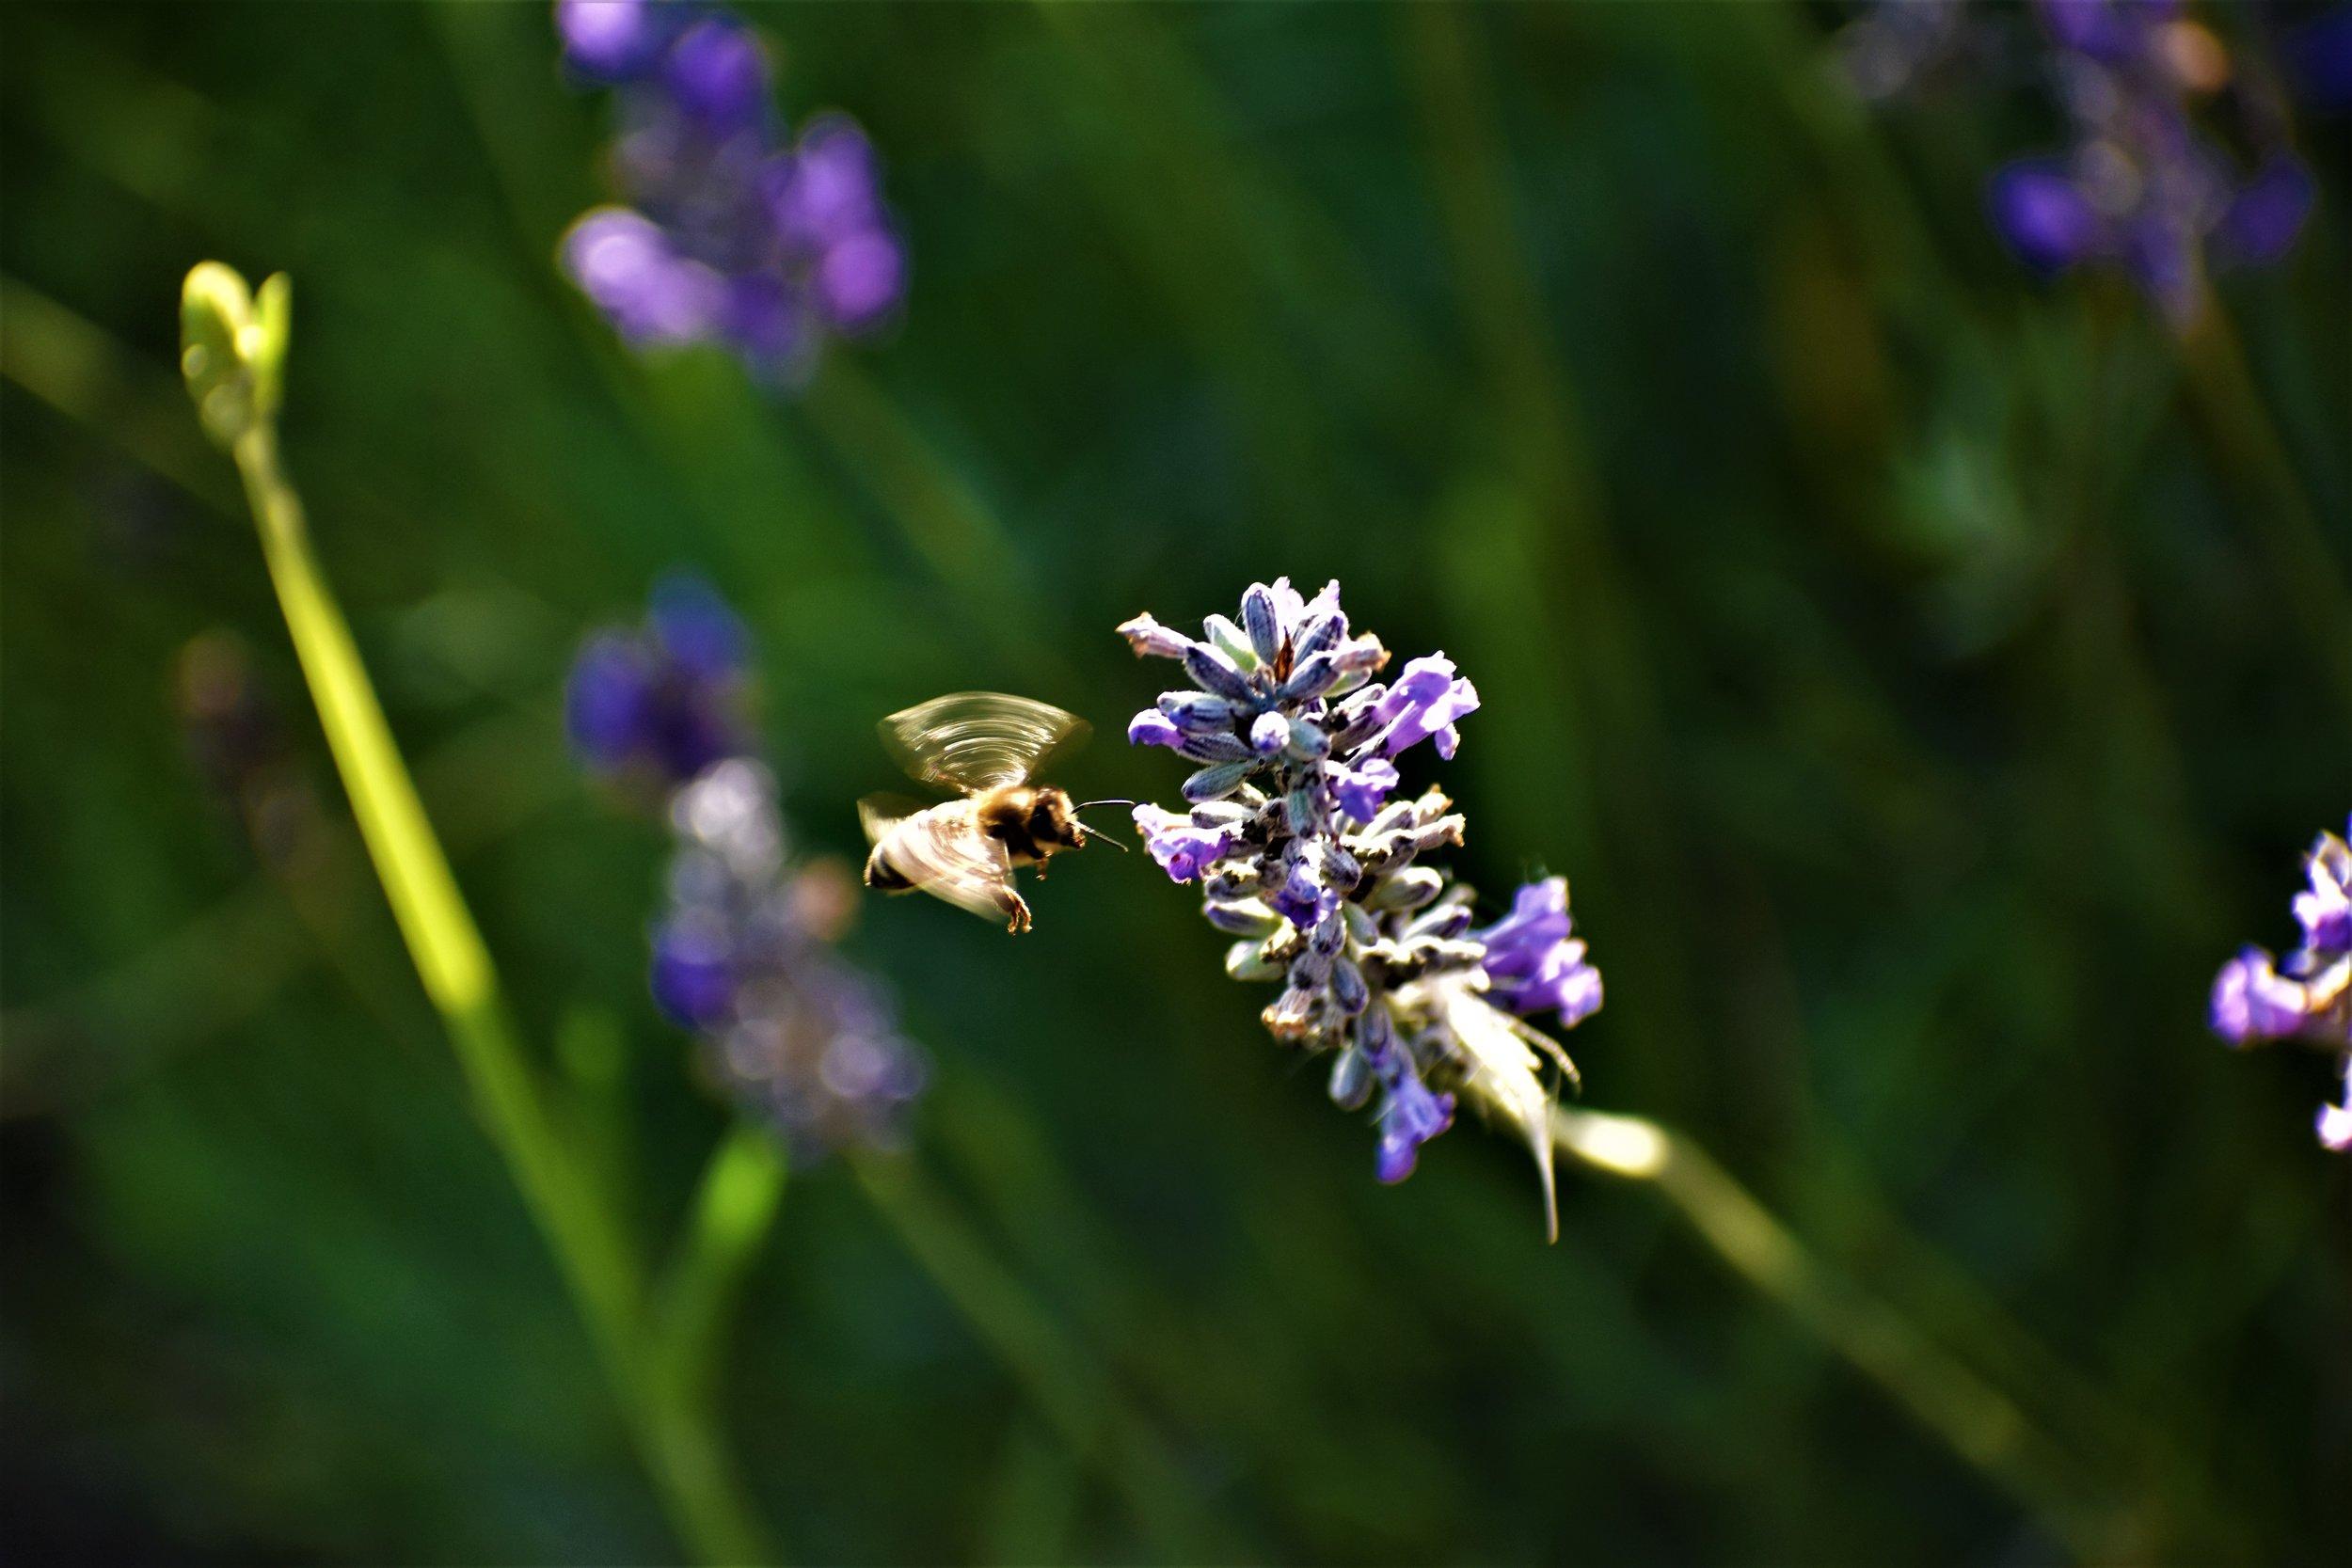 Bees love Lavendar nector